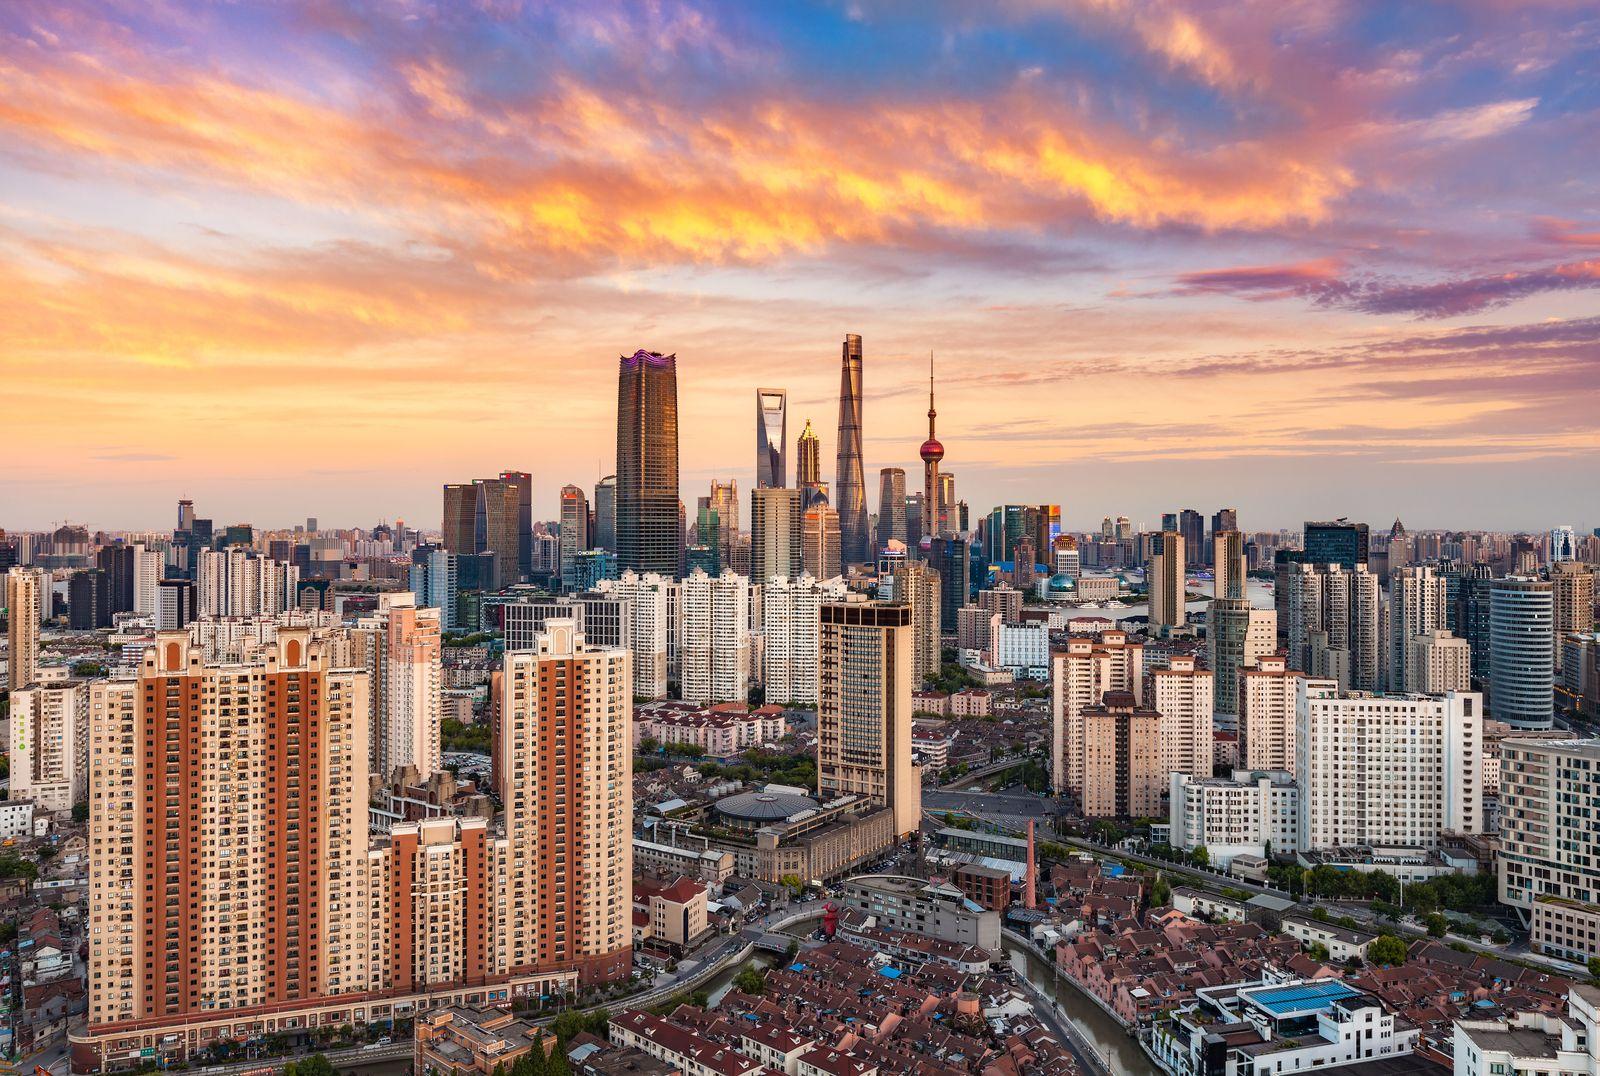 China / Banken-Viertel / Banken / Konjunktur / Shanghai